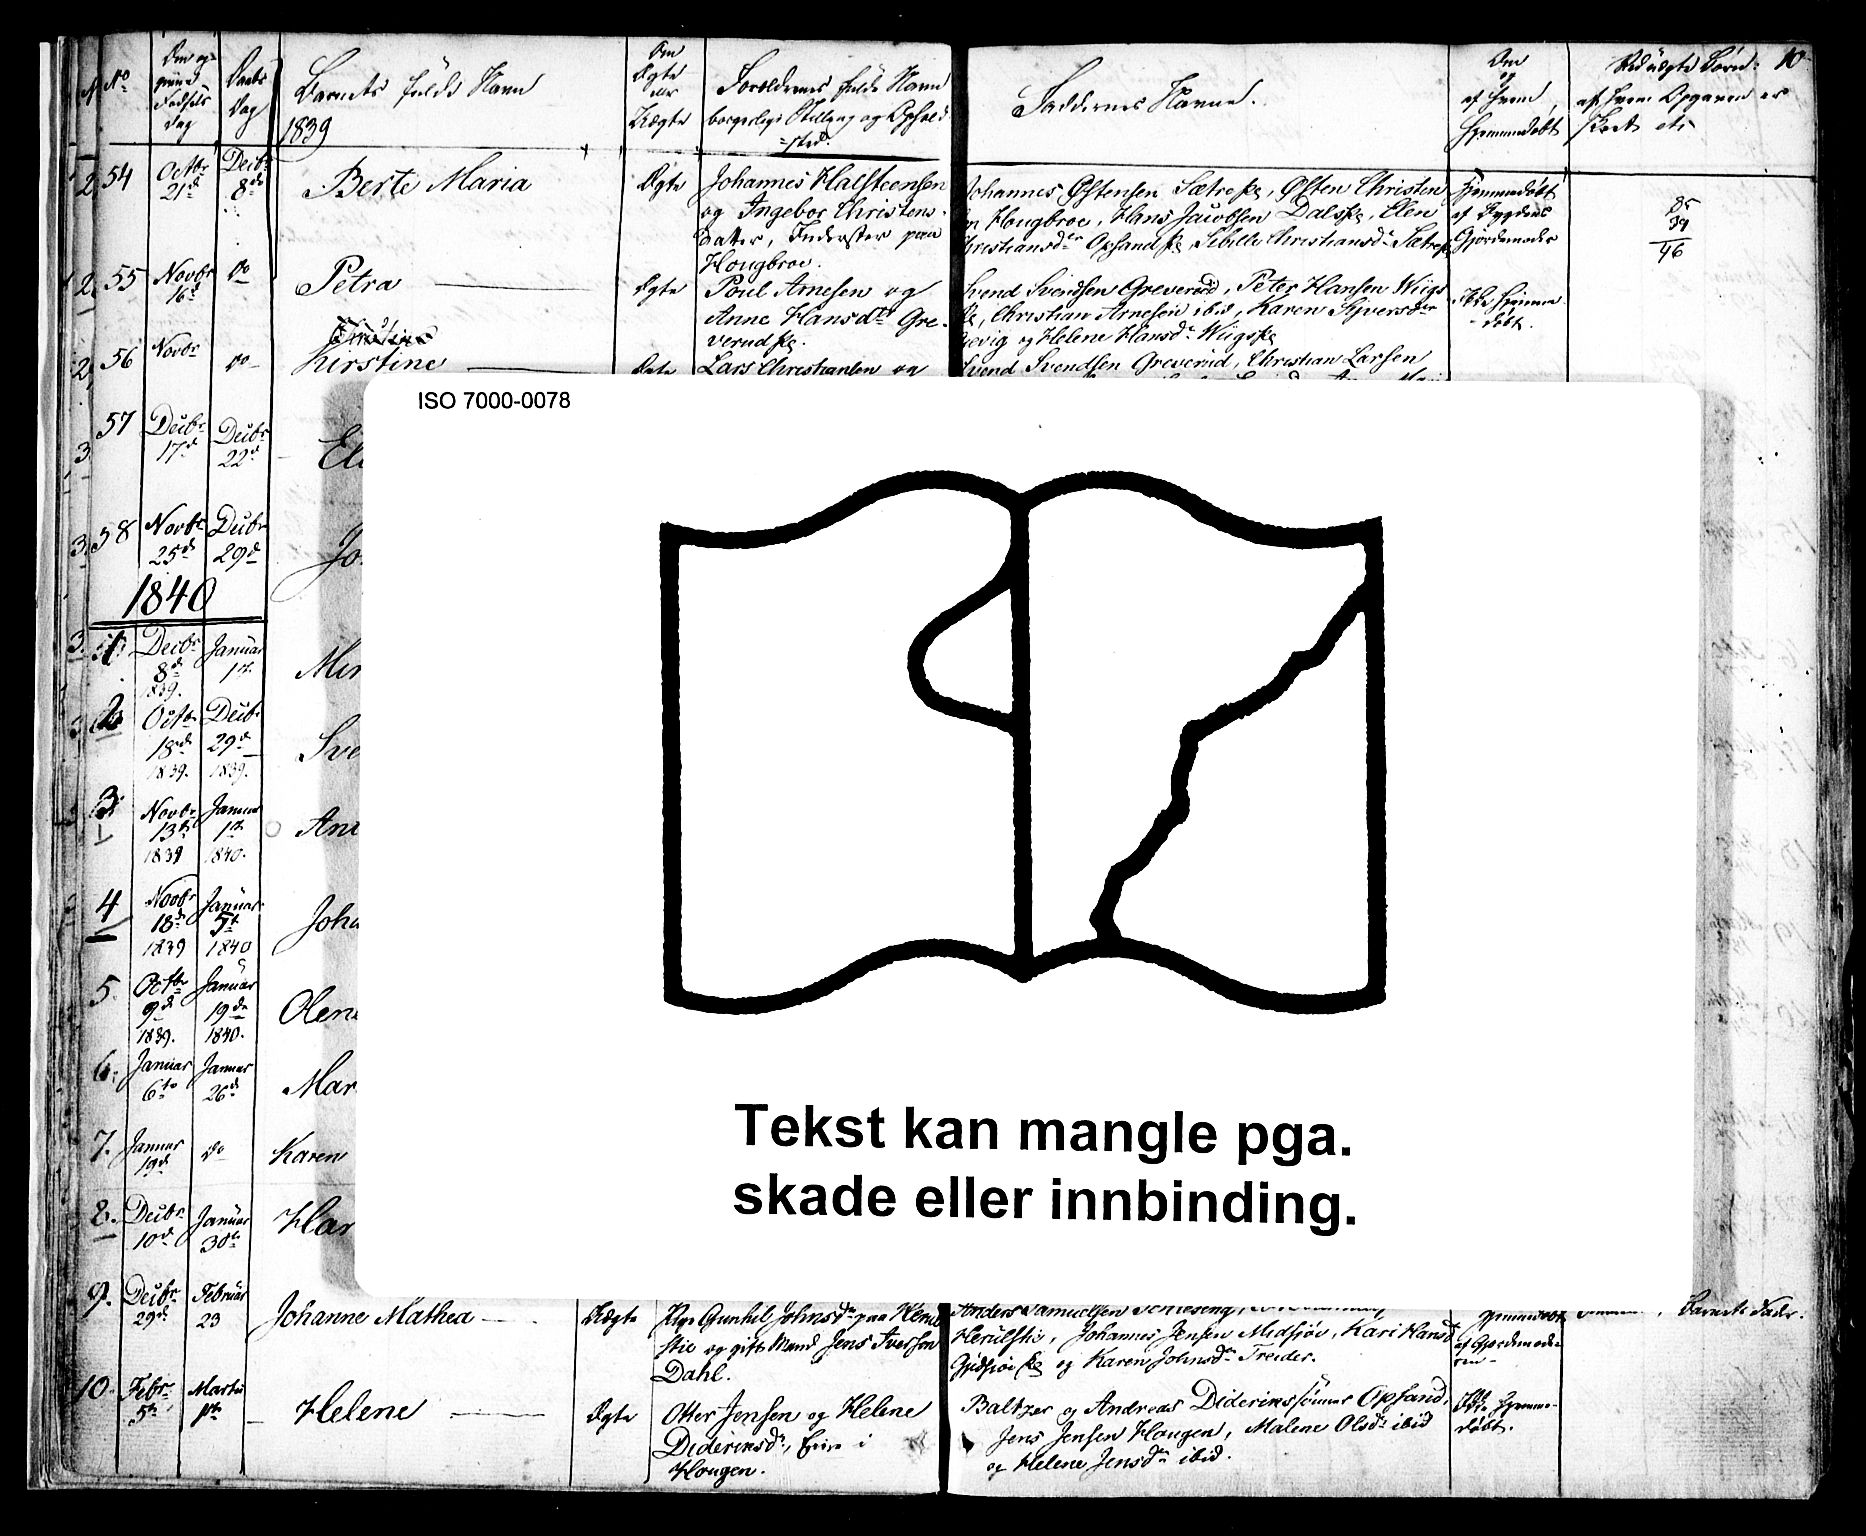 SAO, Kråkstad prestekontor Kirkebøker, F/Fa/L0005: Ministerialbok nr. I 5, 1837-1847, s. 10